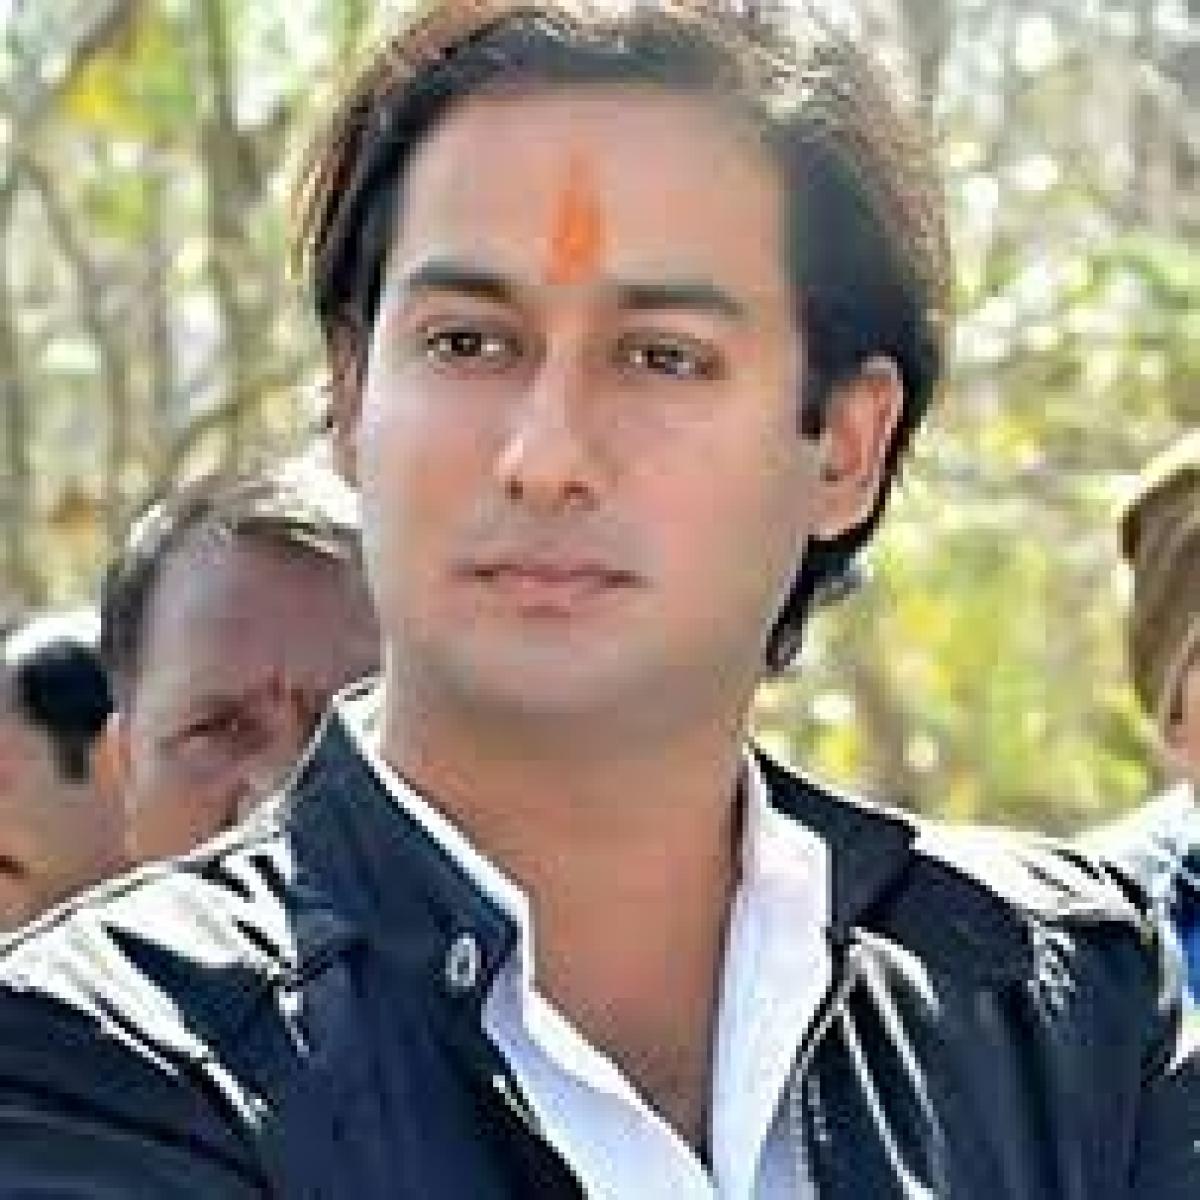 Bhopal: Jaivardhan Singh, Make Master Plans for Bhopal-Sehore & Indore-Ujjain-Dewas